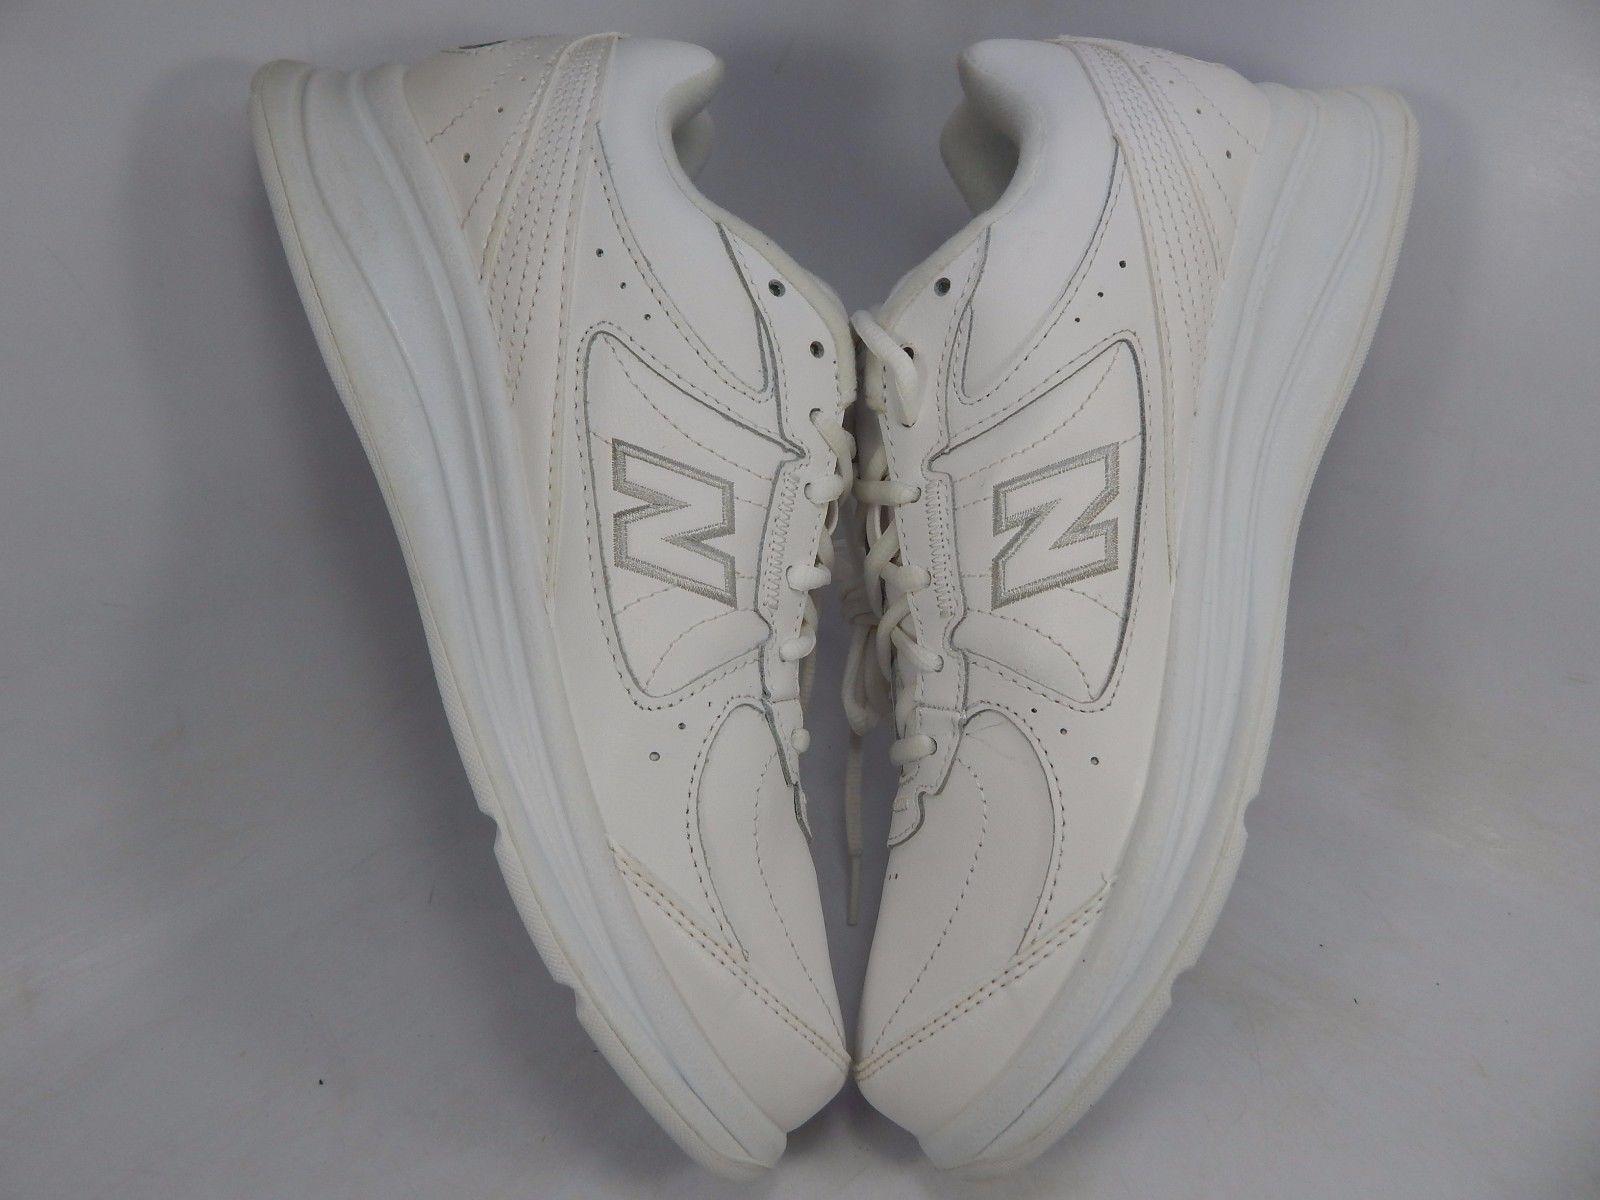 MISMATCH New Balance 577 Women's Walking Shoes Size 9 M Left & Size 9.5 M Right